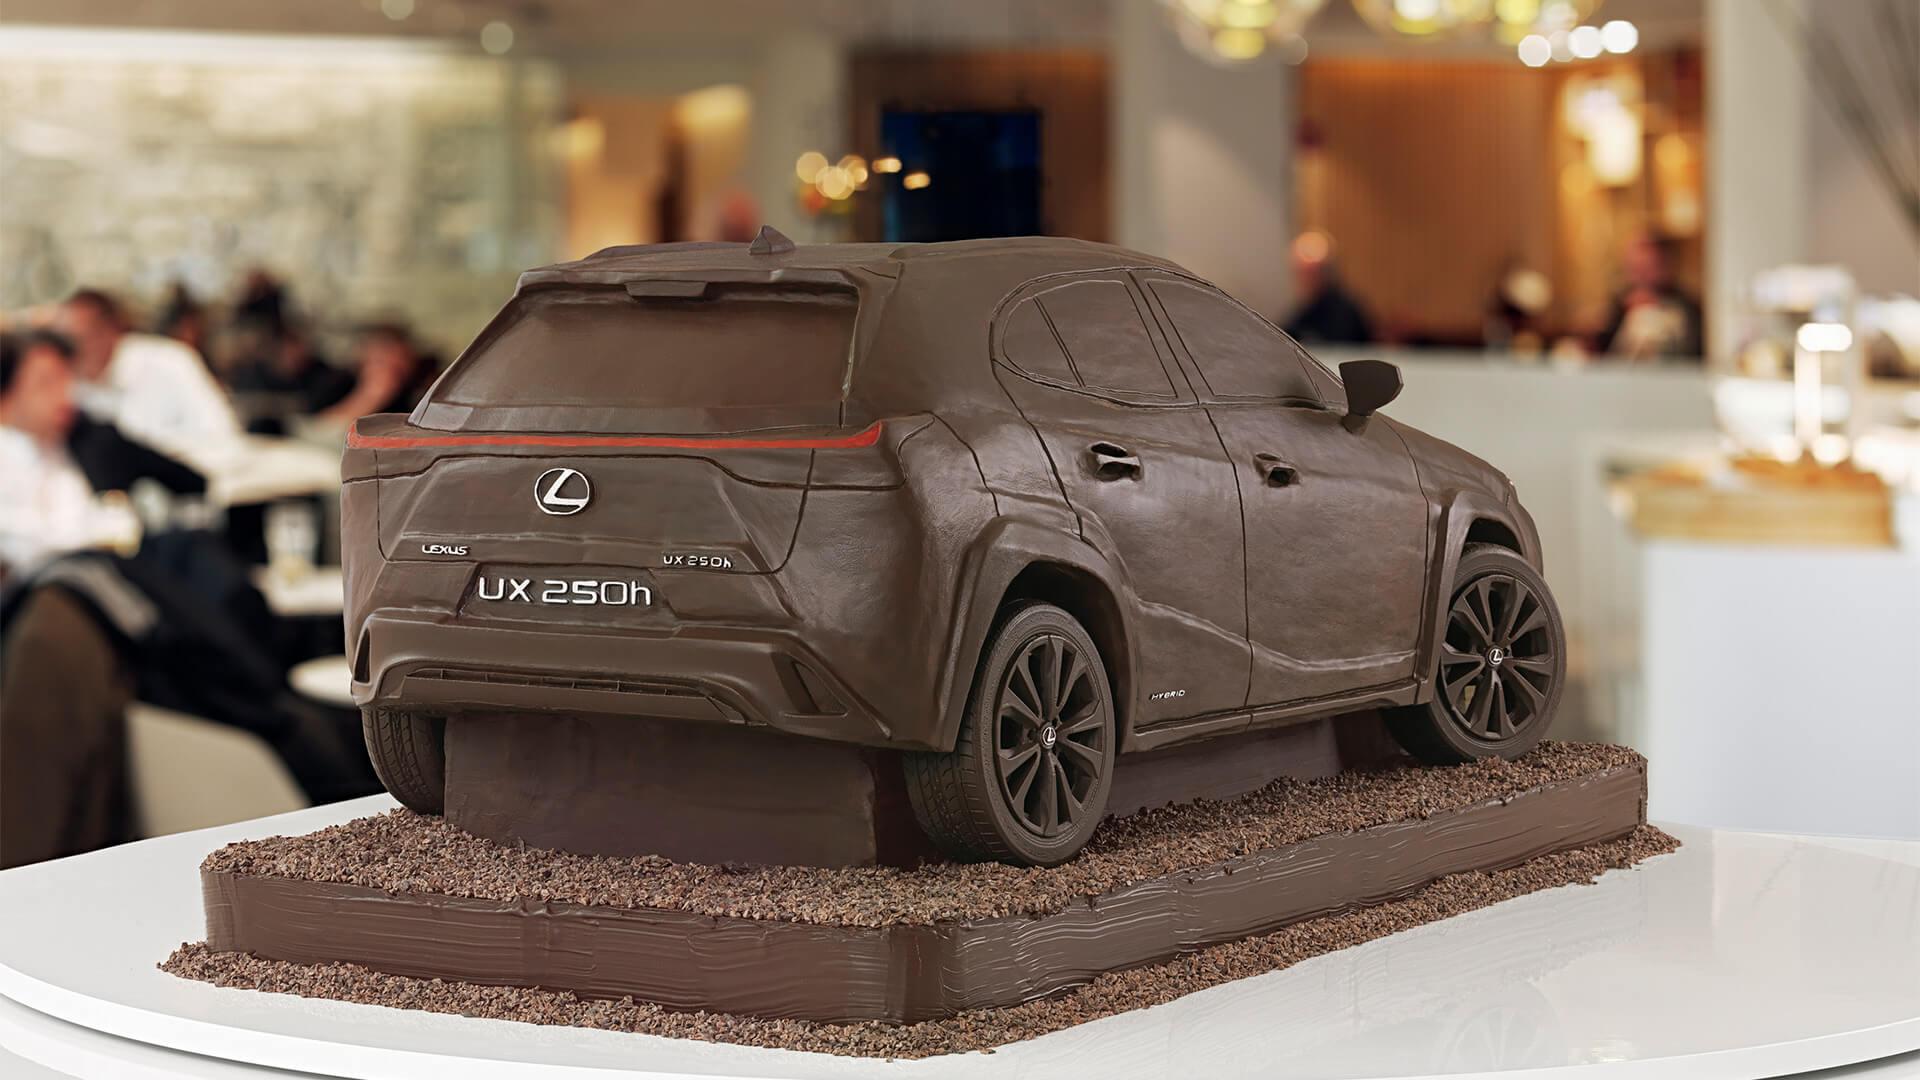 2019 lexus lounge UX Chocolate Car 1920x1080 02